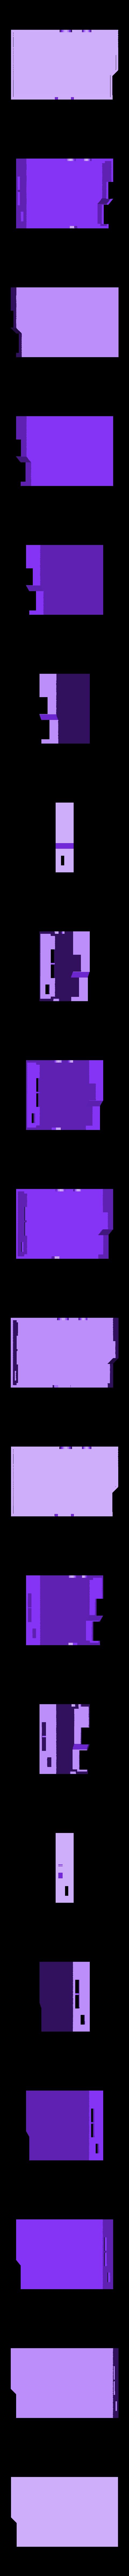 raspicase_bottom.stl Download free STL file Raspberry Pi Case - Pi Symbol • Object to 3D print, Lassaalk